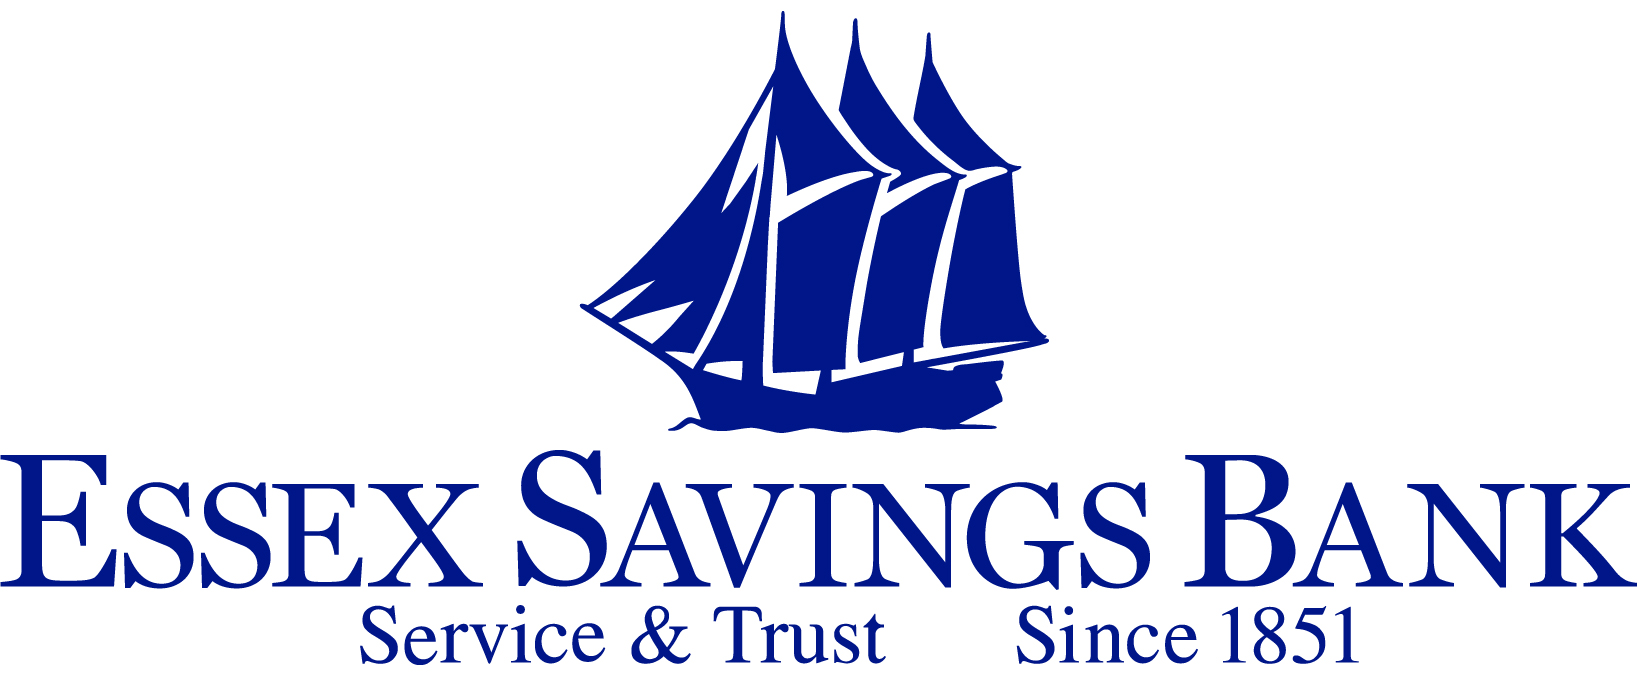 Essex Savings Bank logo